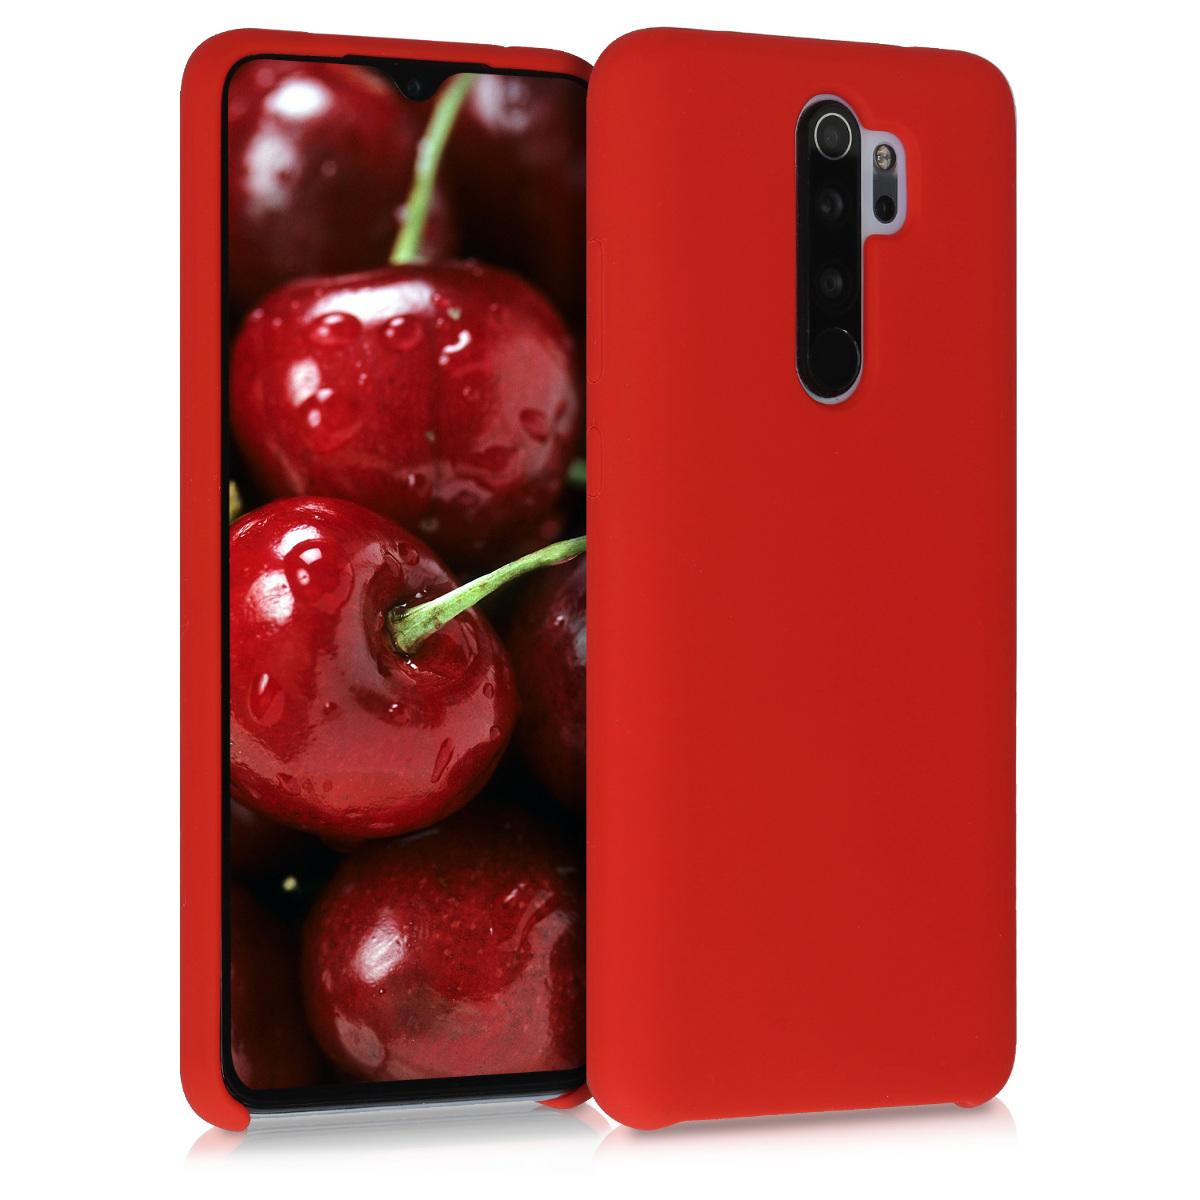 KW Θήκη Σιλικόνης Xiaomi Redmi Note 8 Pro - Soft Flexible Rubber - Red Matte (50248.51)